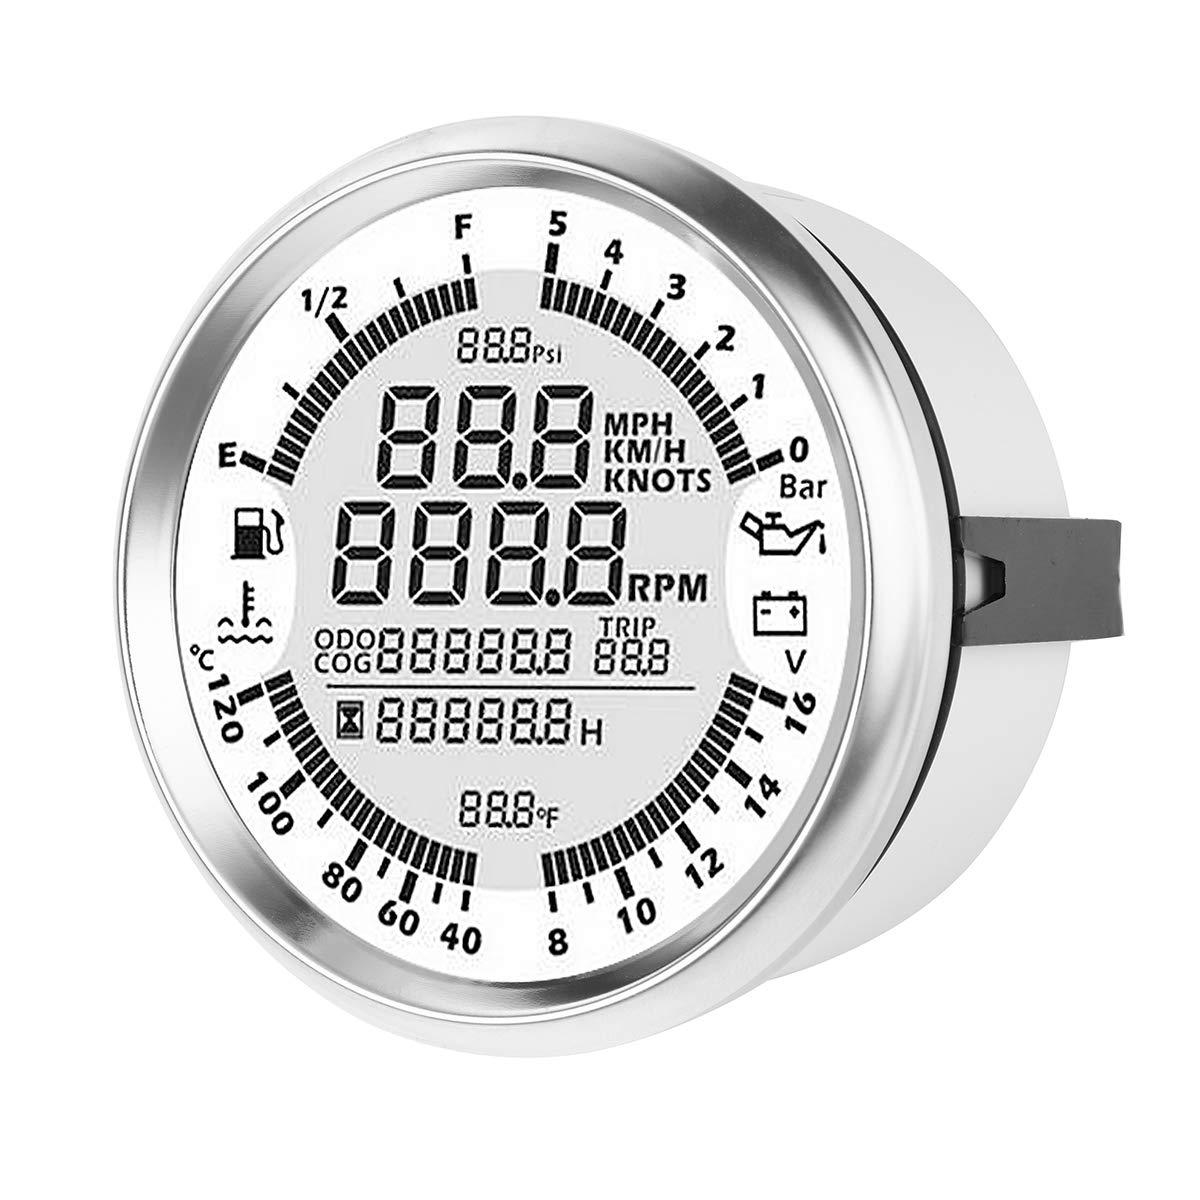 NeDonald 85mm GPS Speedometer Oil Pressure Fuel Gauge Tachometer with Antenna by NeDonald (Image #2)